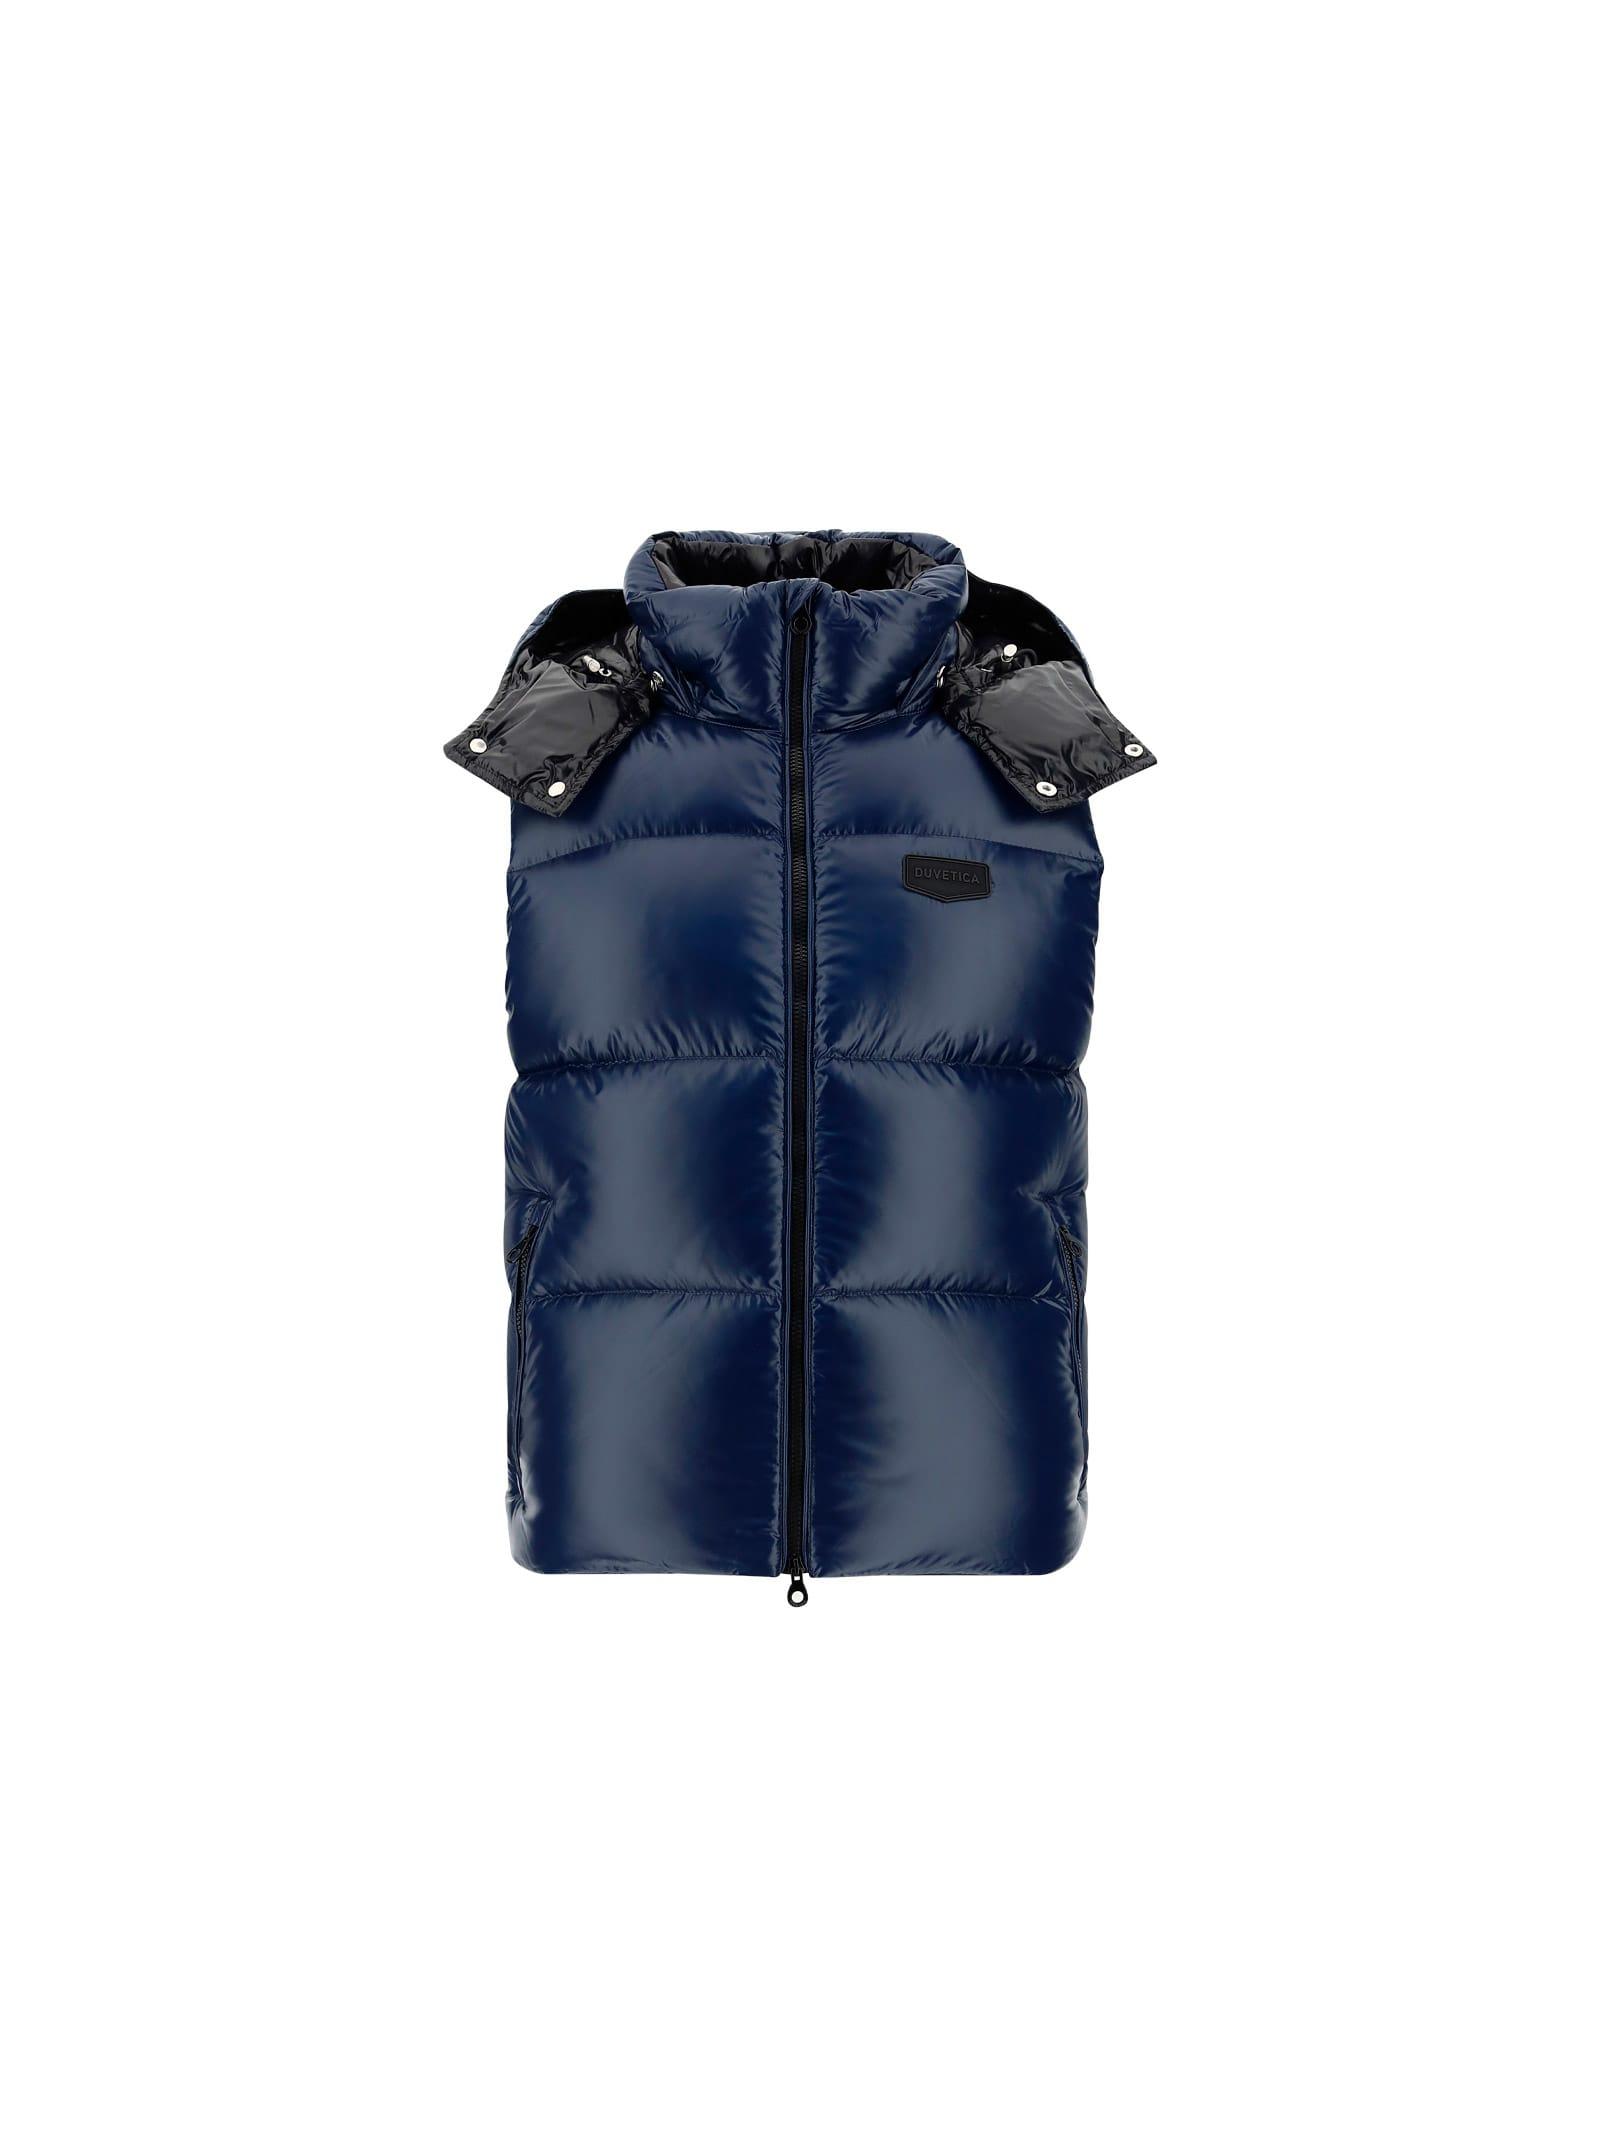 Salino Jacket